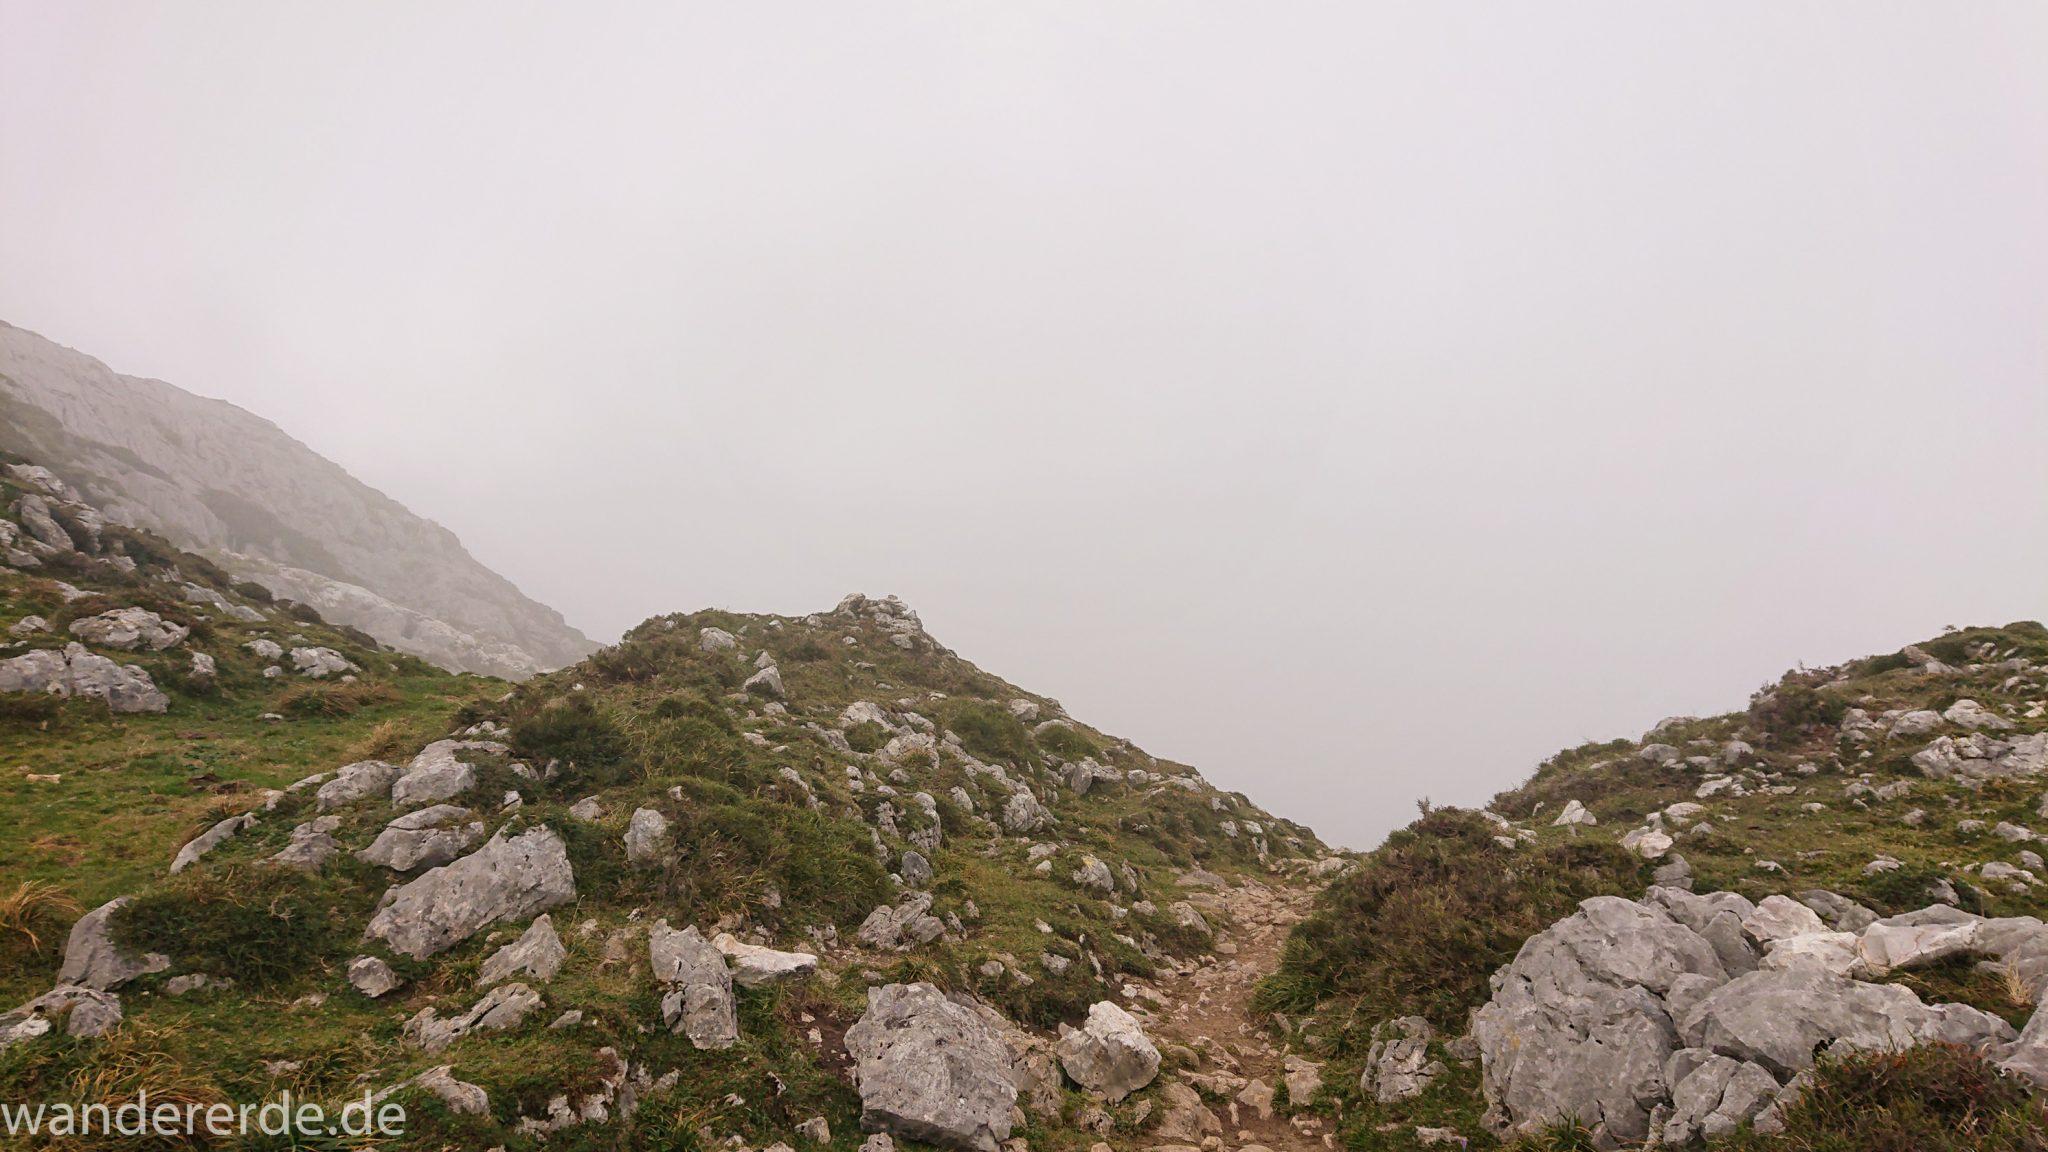 Wanderung Vega de Ario Picos de Europa Spanien, dichte Wolken, Bergregion in Nordspanien, Wandern, grüne Wiesen